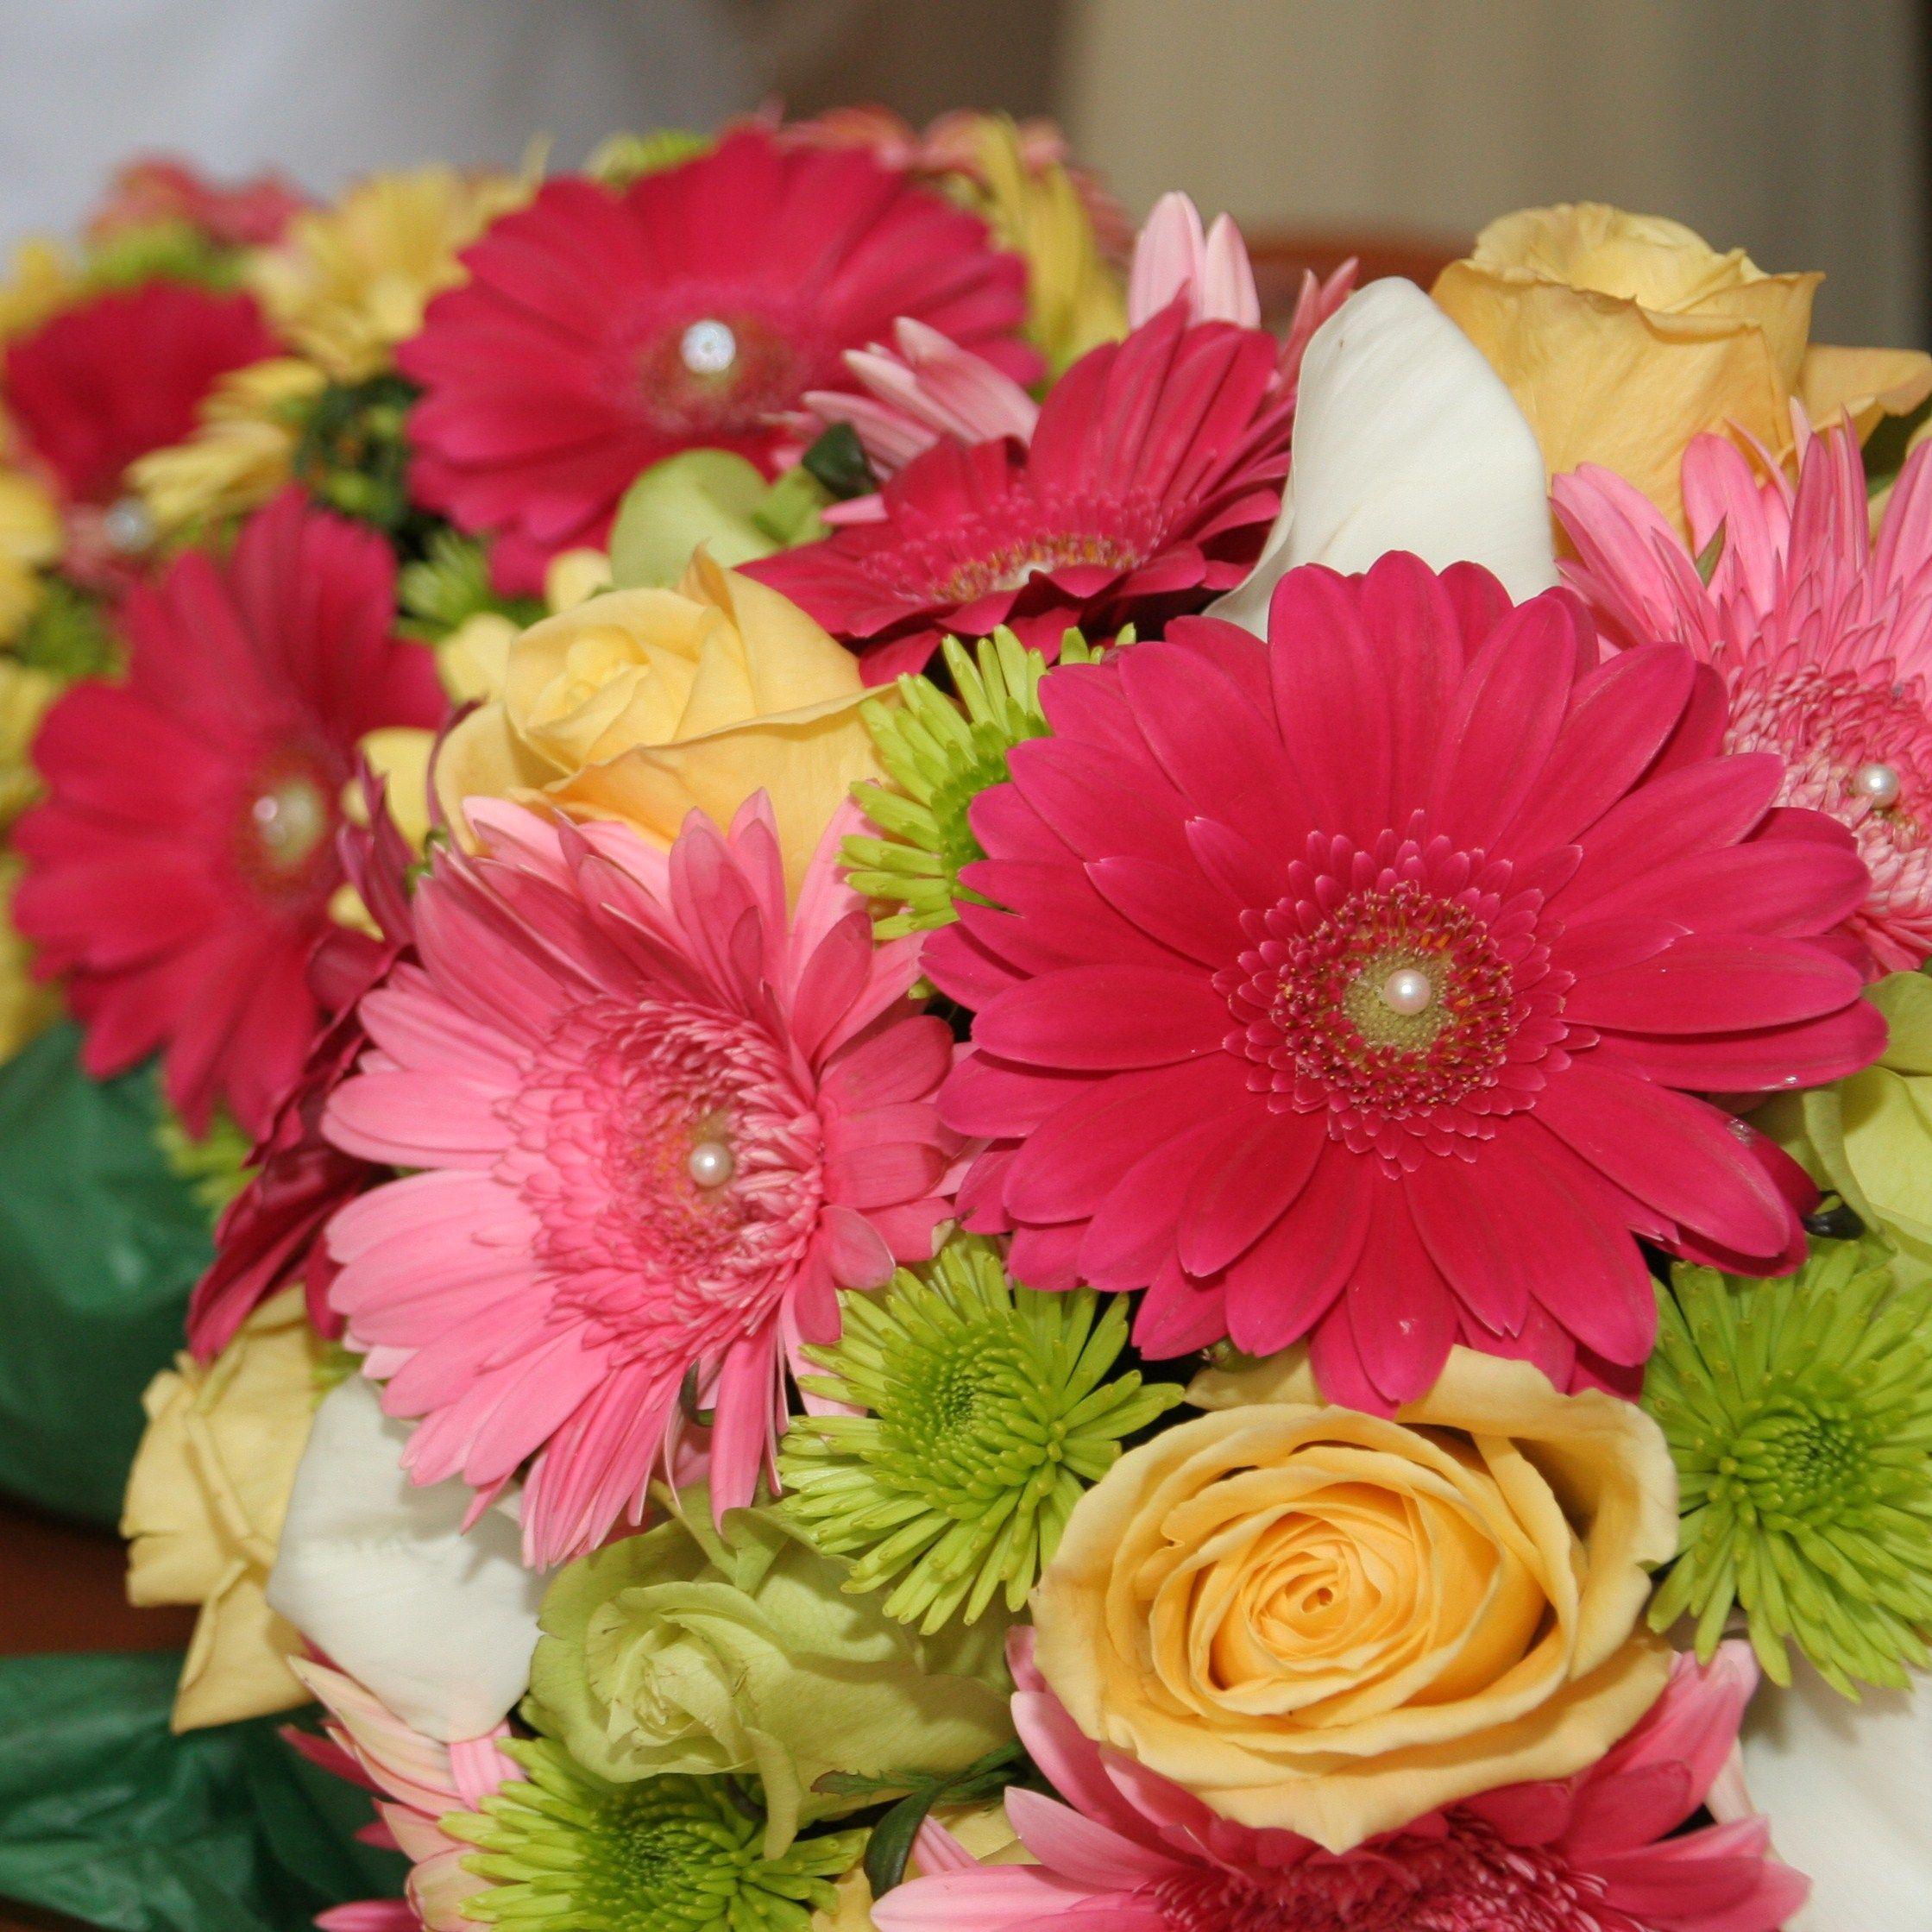 Wedding Flowers With Daisies : Gerber daisy bridal bouquet wedding ideas